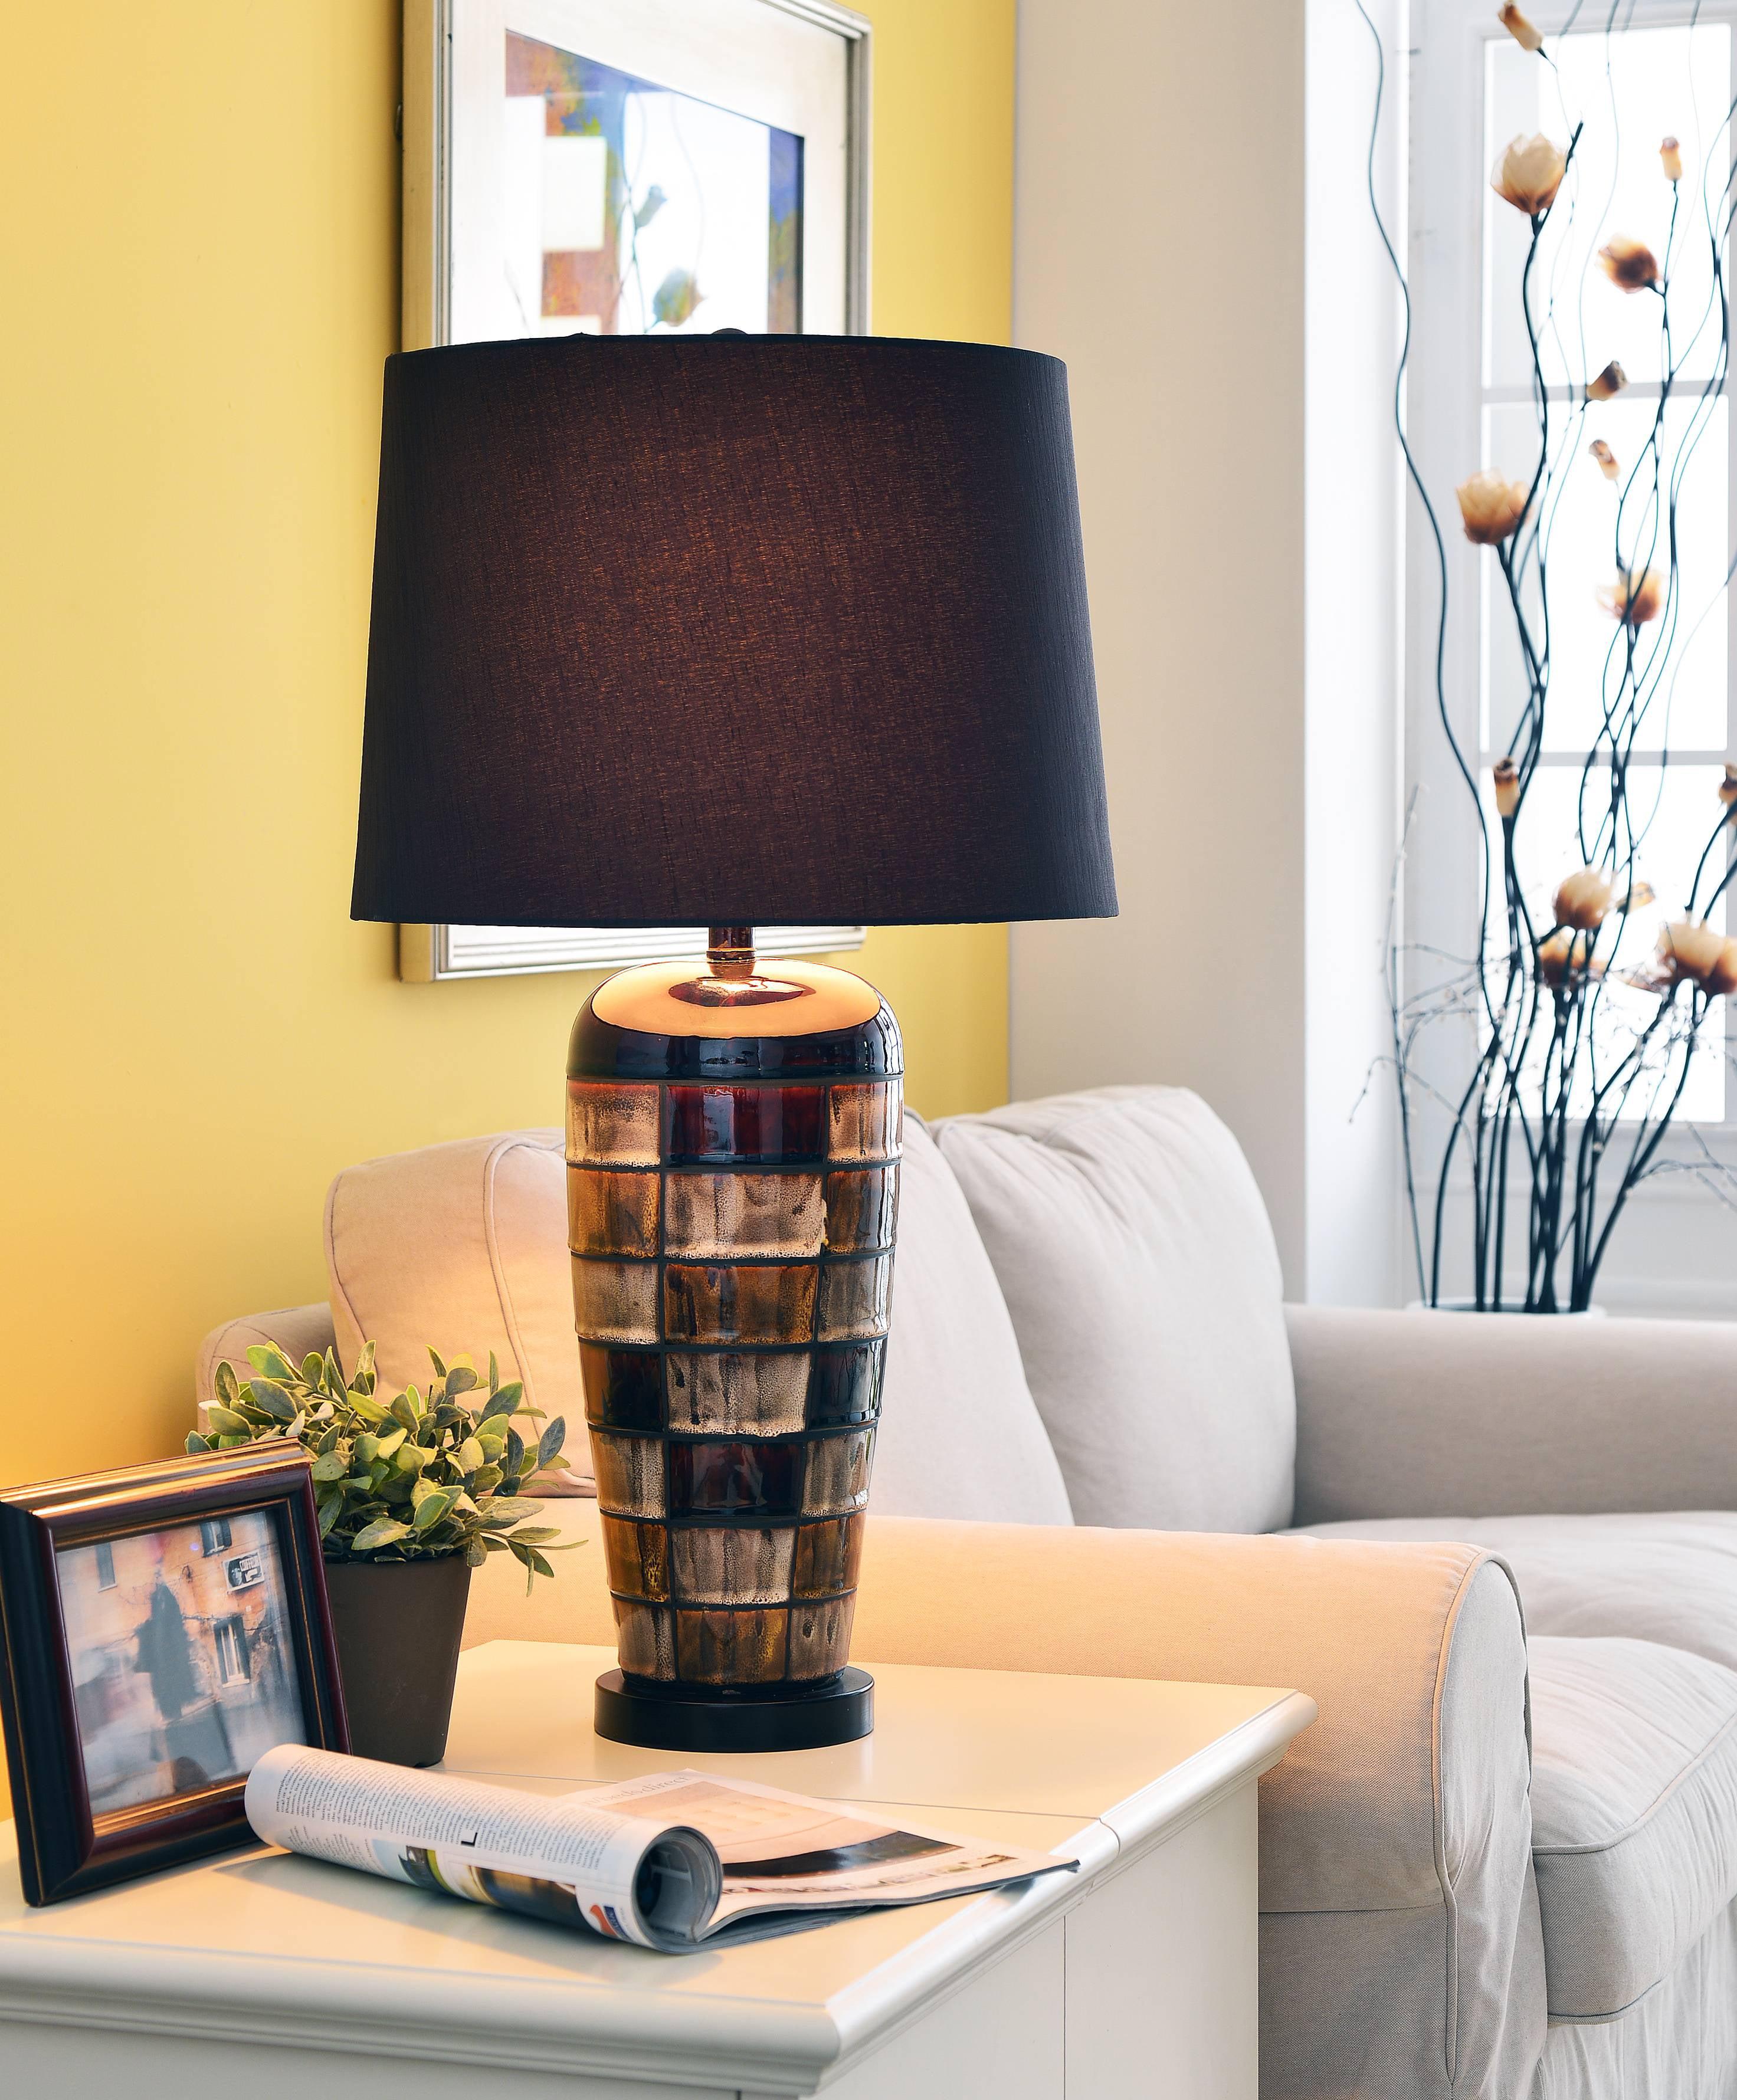 Kenroy Home Torino Table Lamp, Ceramic Squares